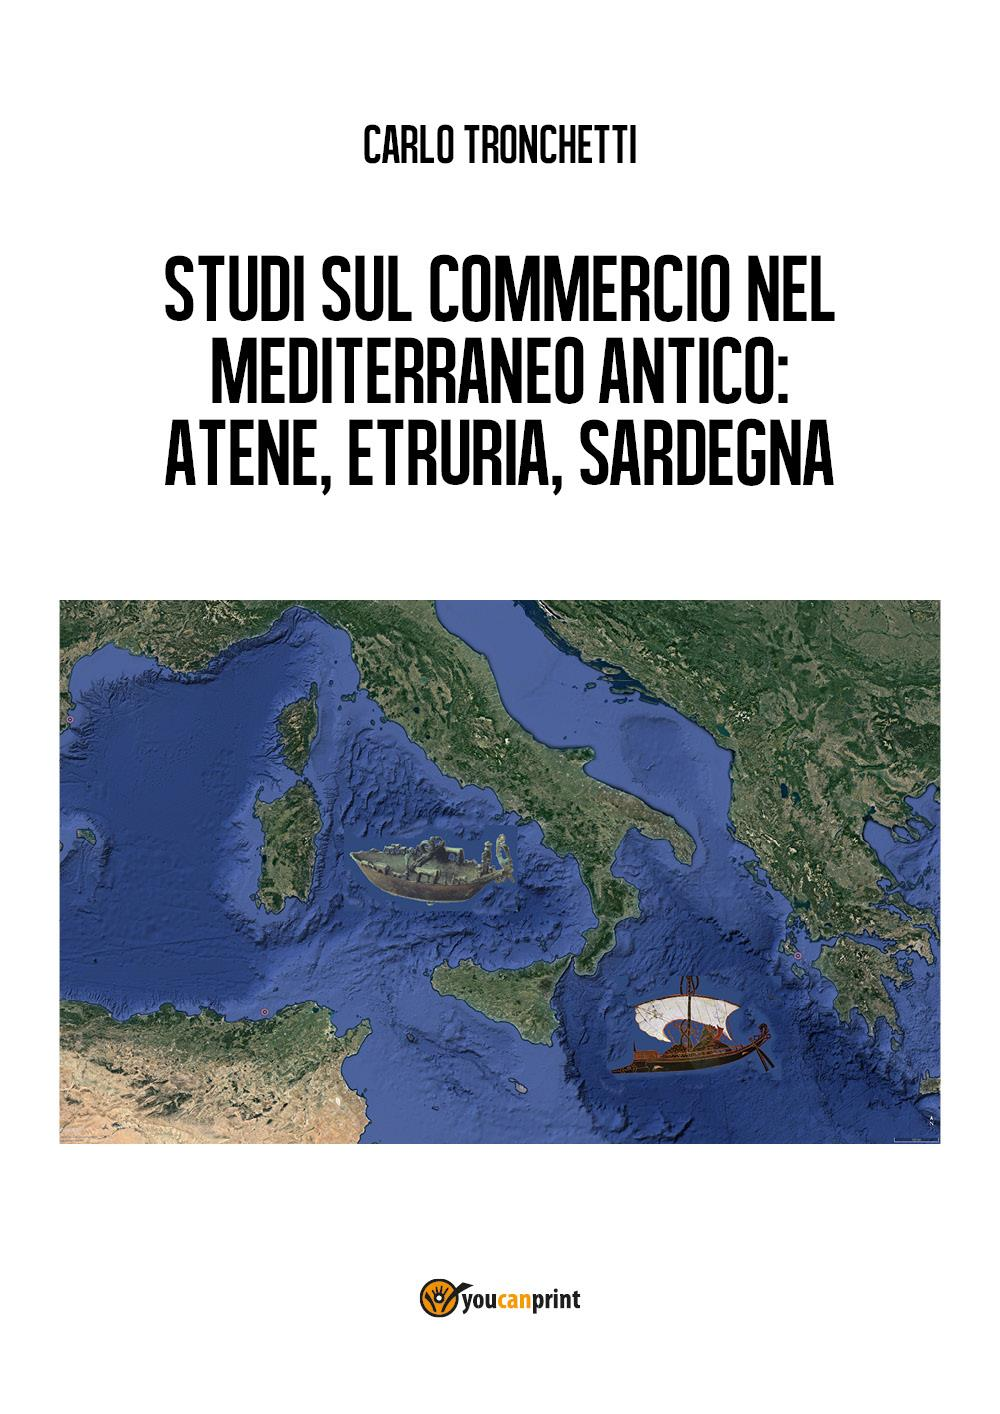 Studi sul commercio nel Mediterraneo antico: Atene, Etruria, Sardegna